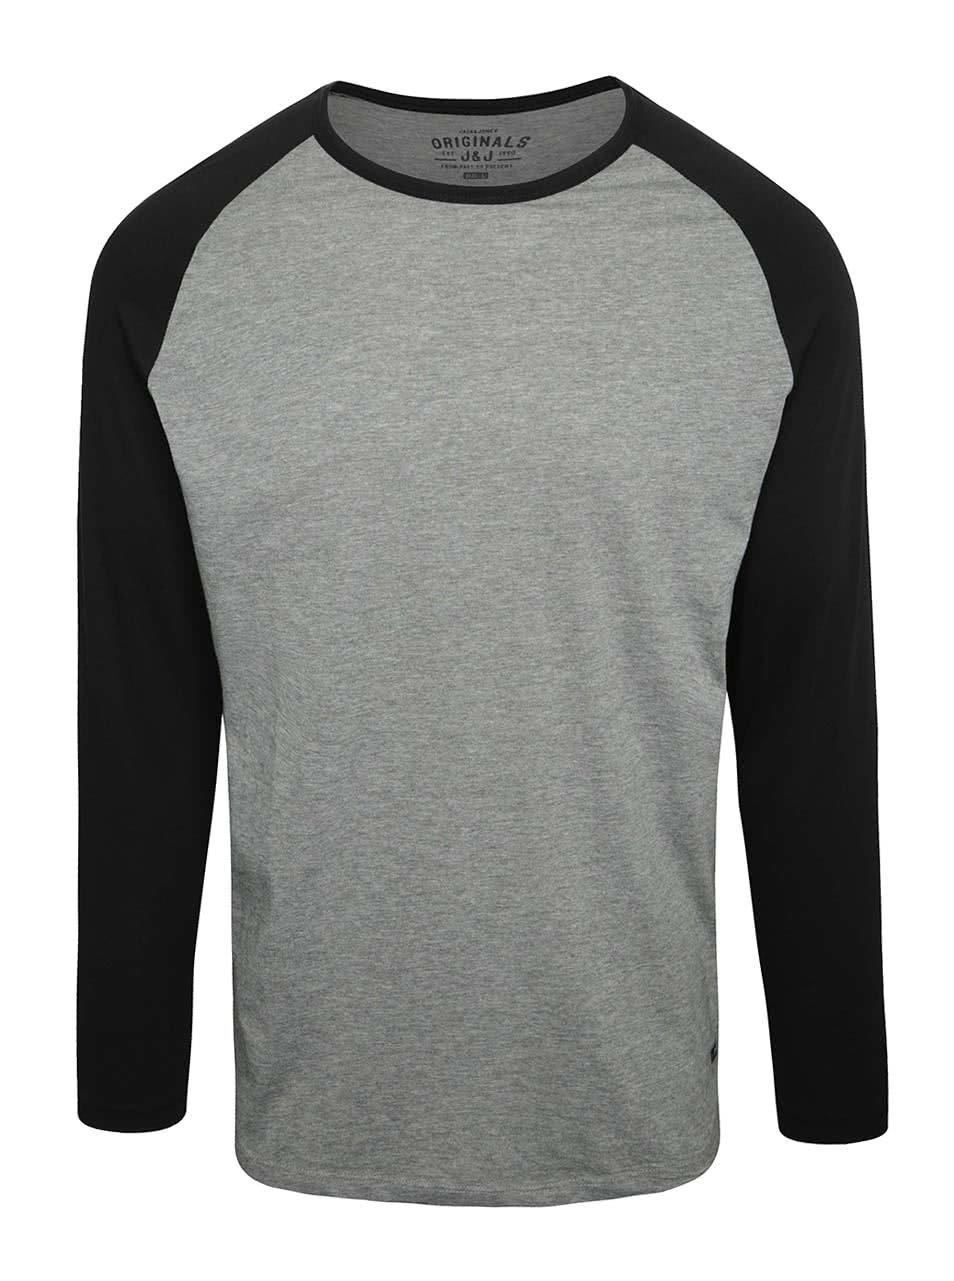 Šedé triko s černými rukávy Jack   Jones Stan ... aaccc95daf